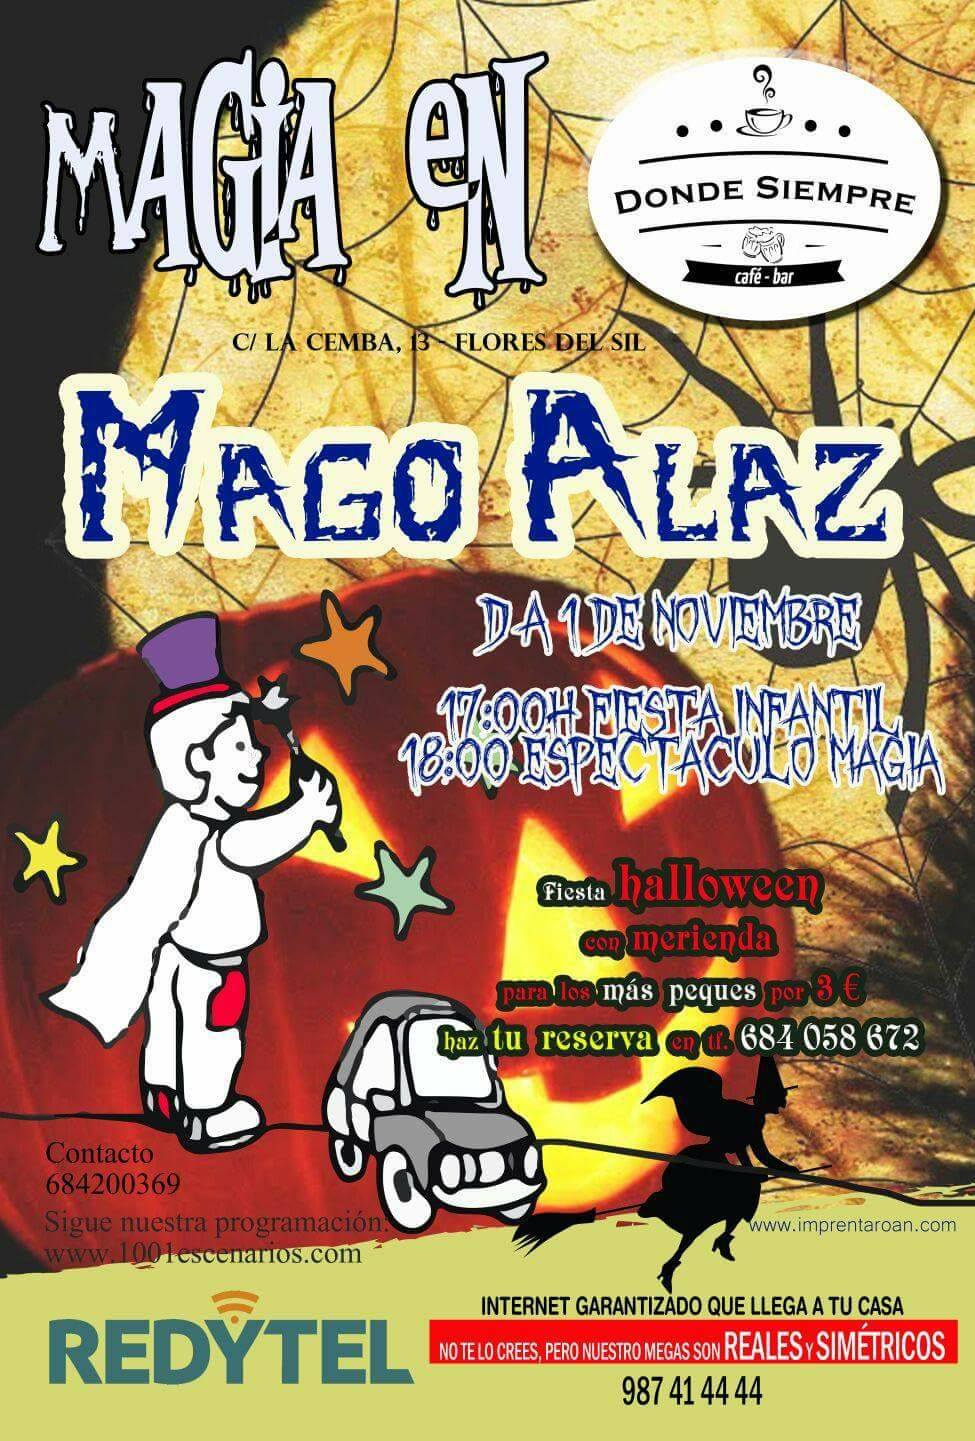 Fiesta infantil de Hallowen con magia 2